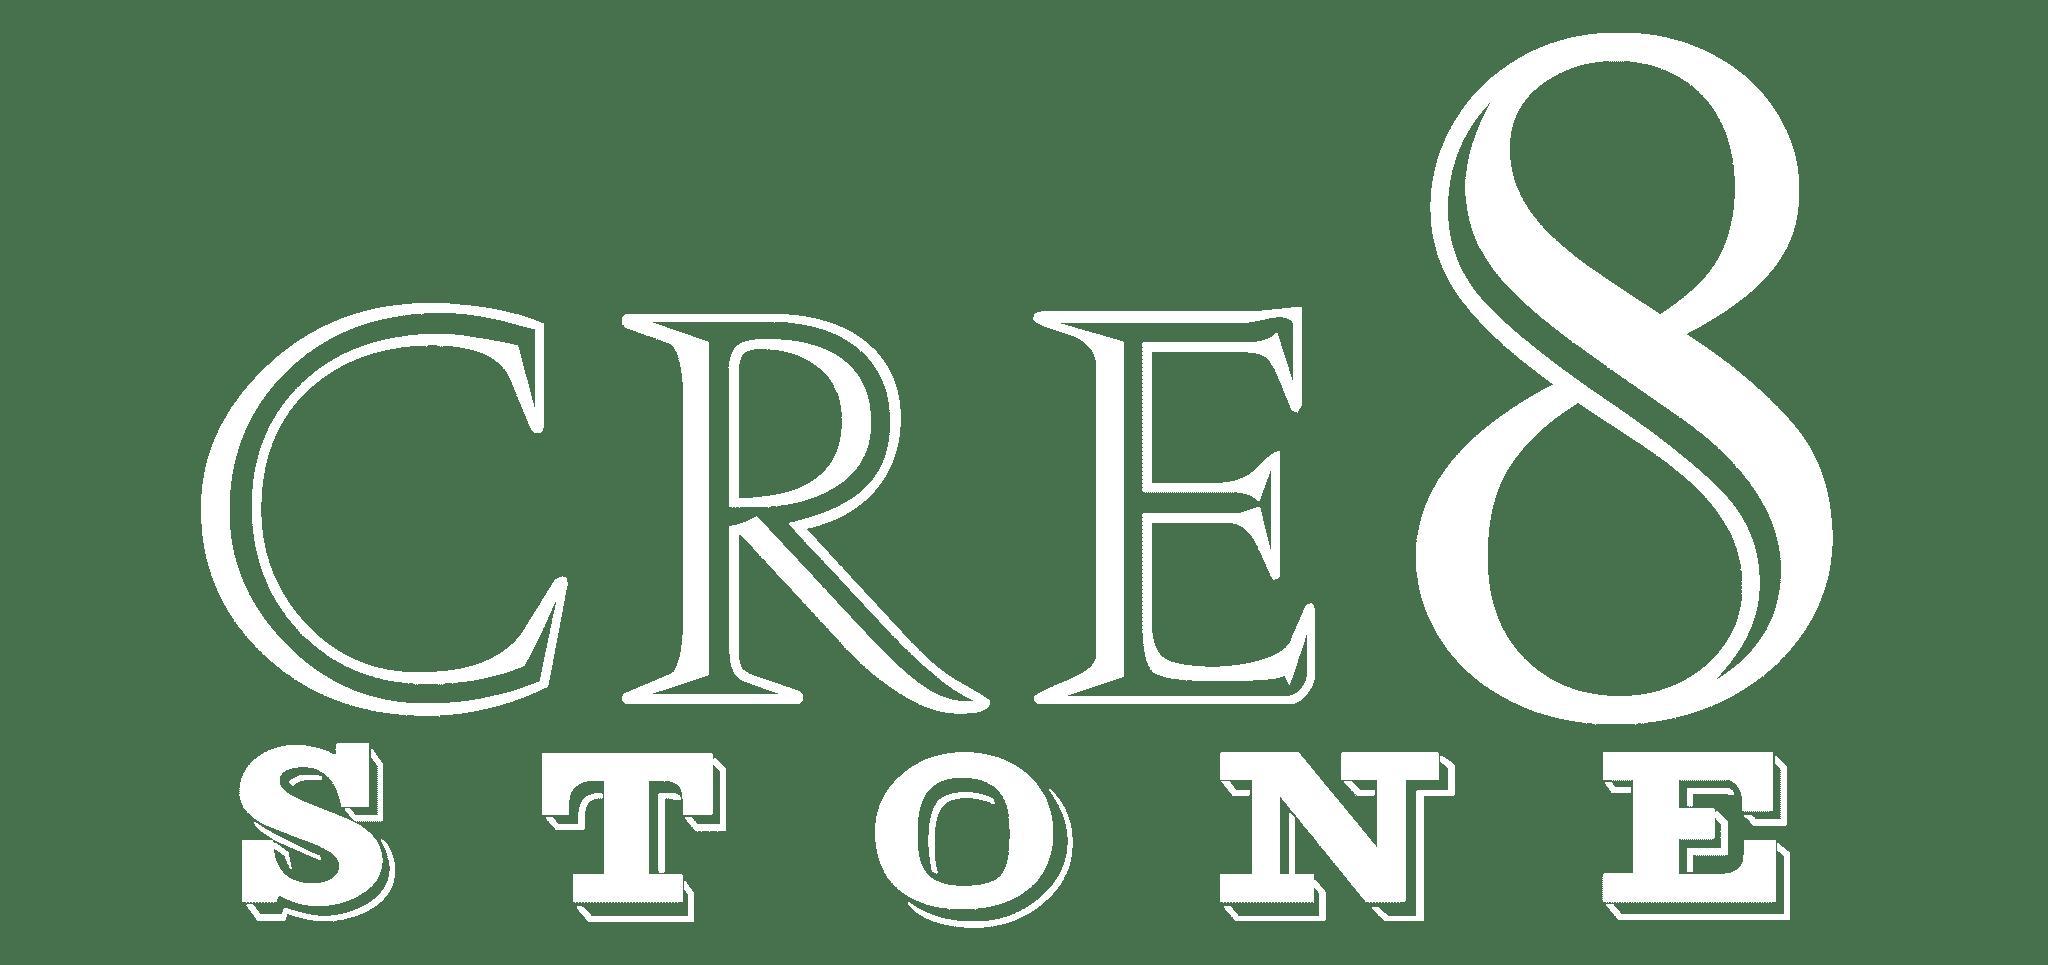 cre8 logo WHITE